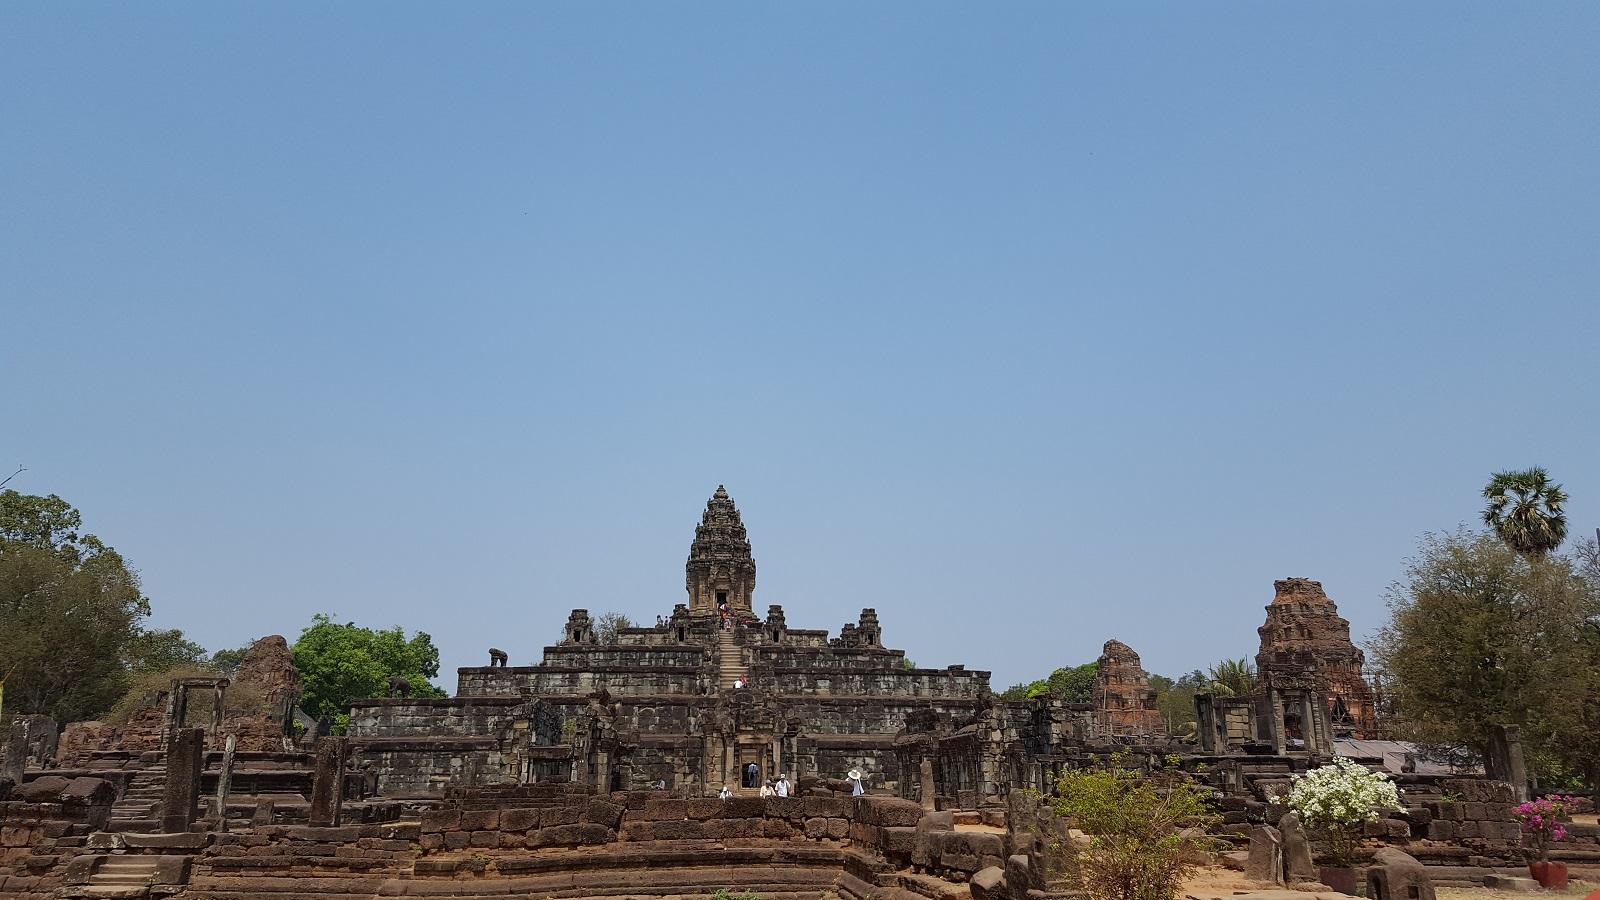 Kambodscha, Siem Reap